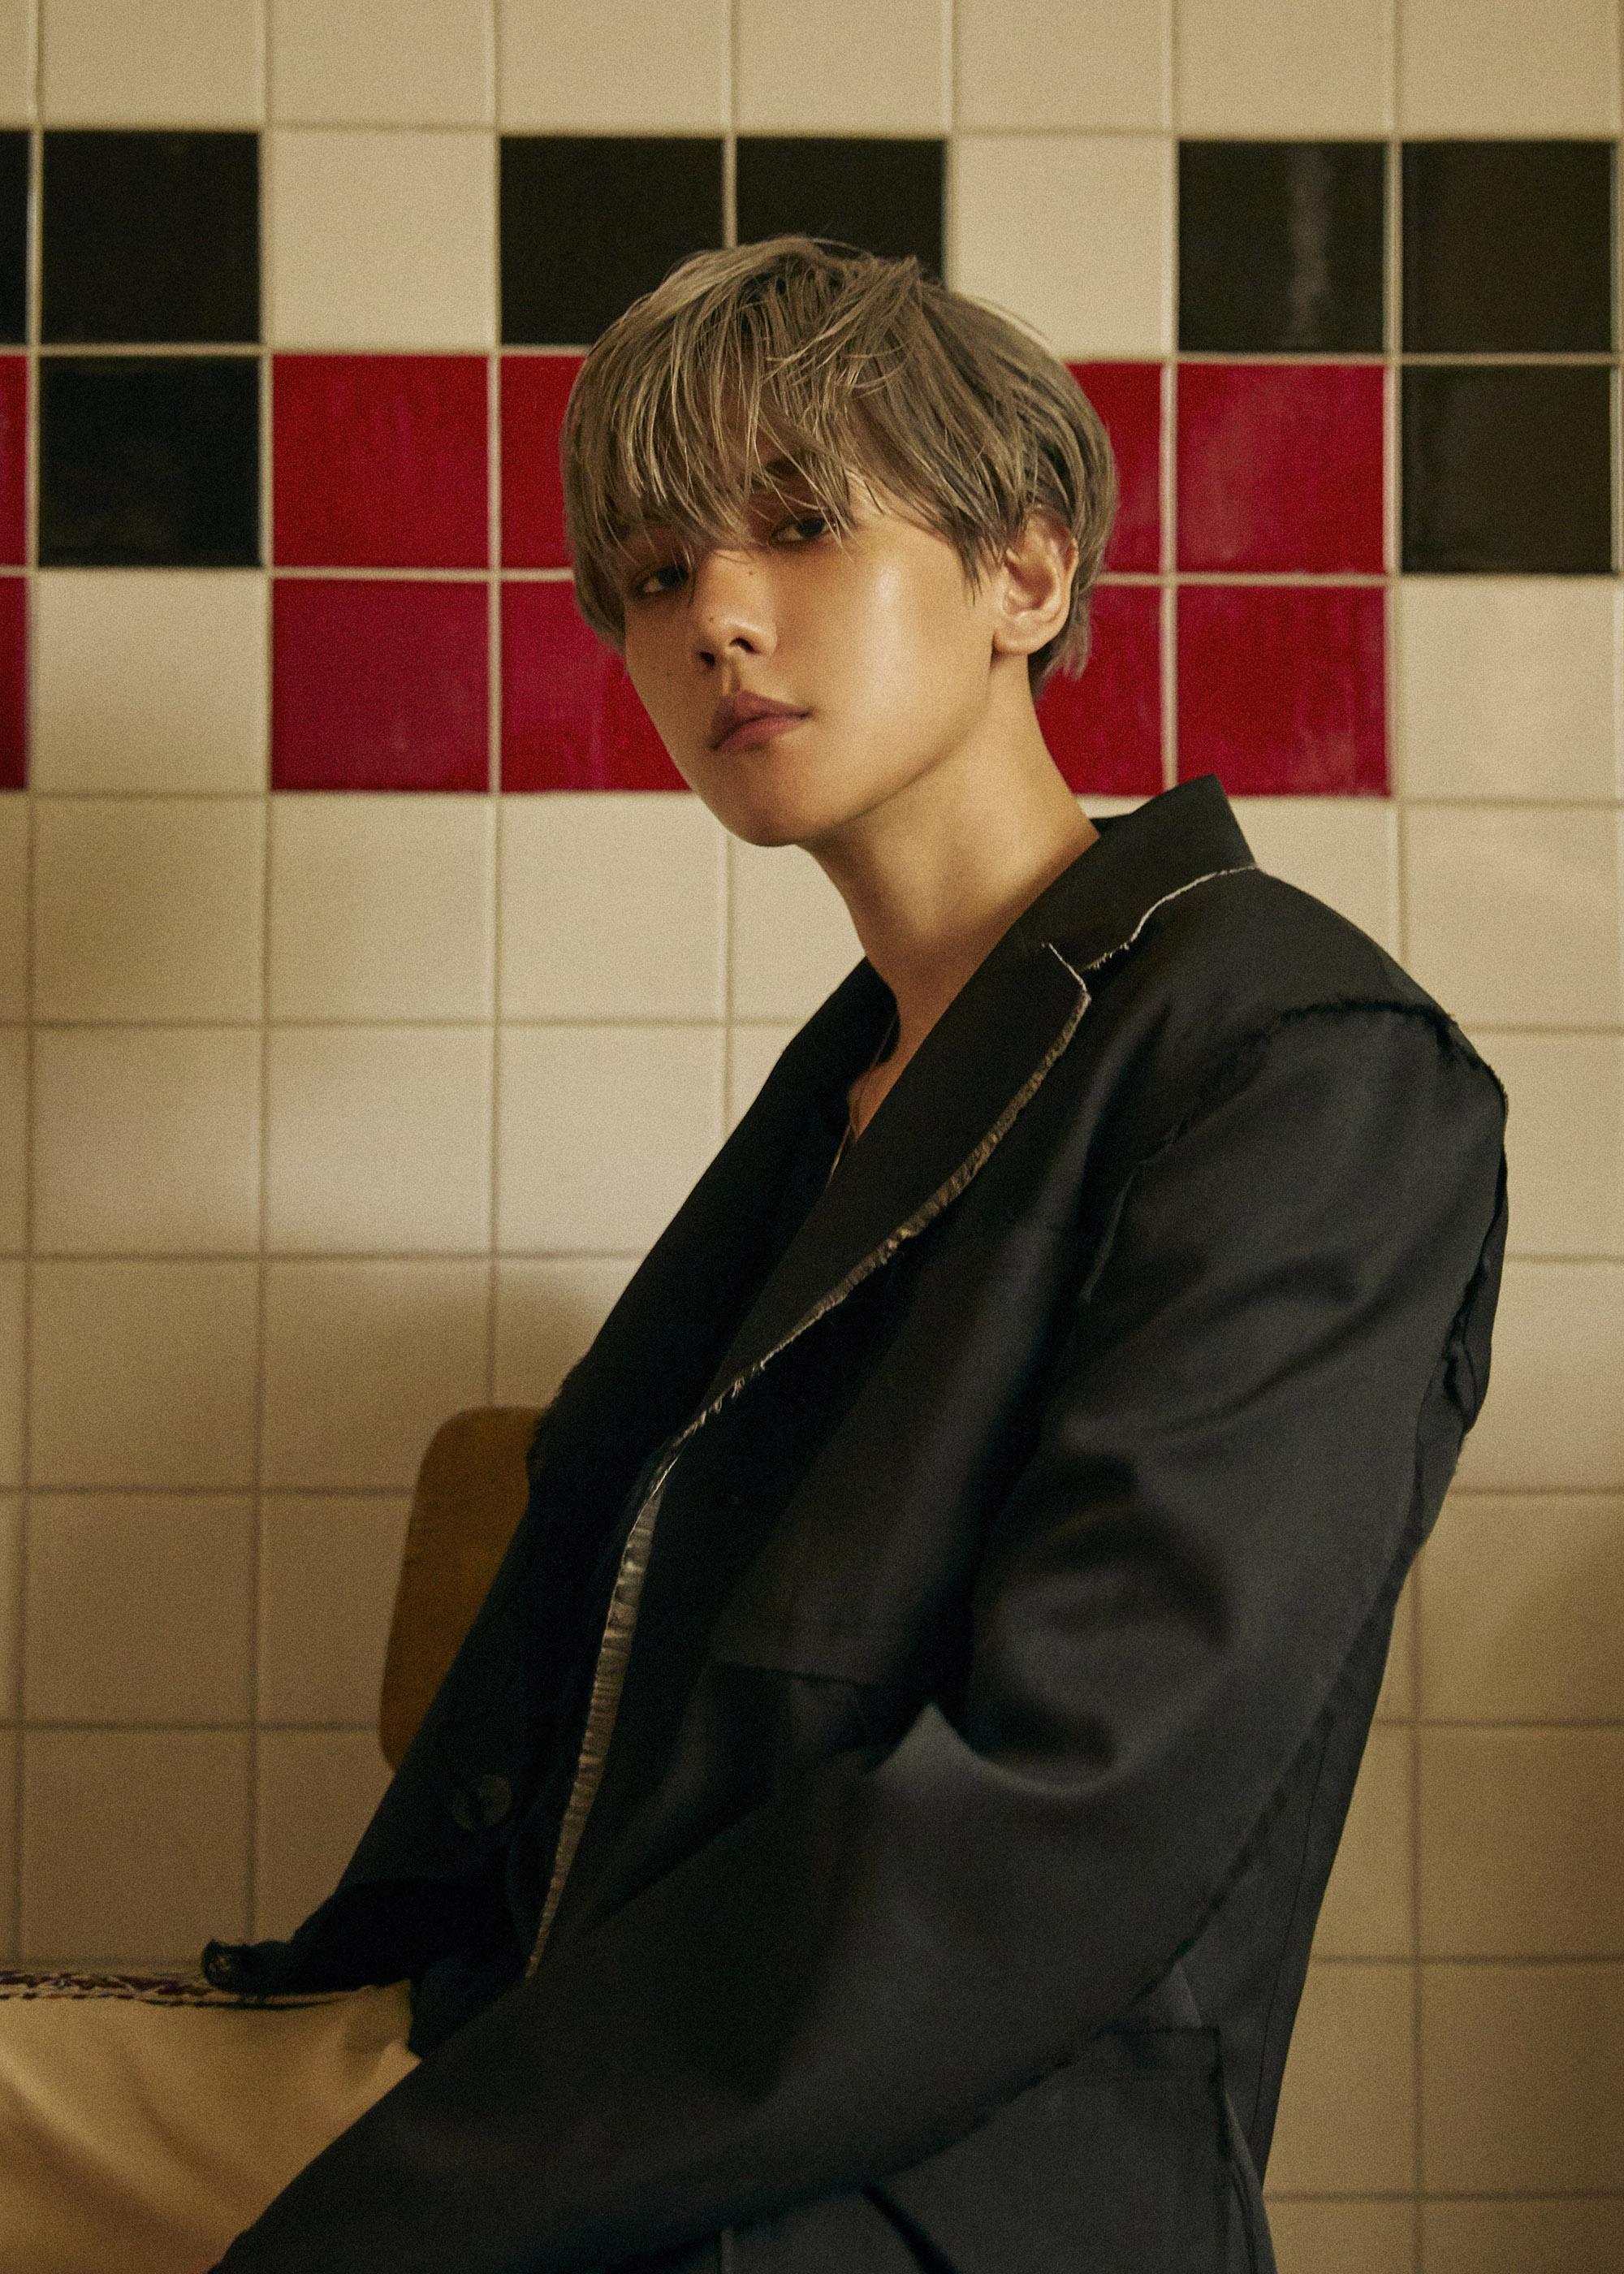 EXO伯贤首张个人专辑《City Lights》预售破40万